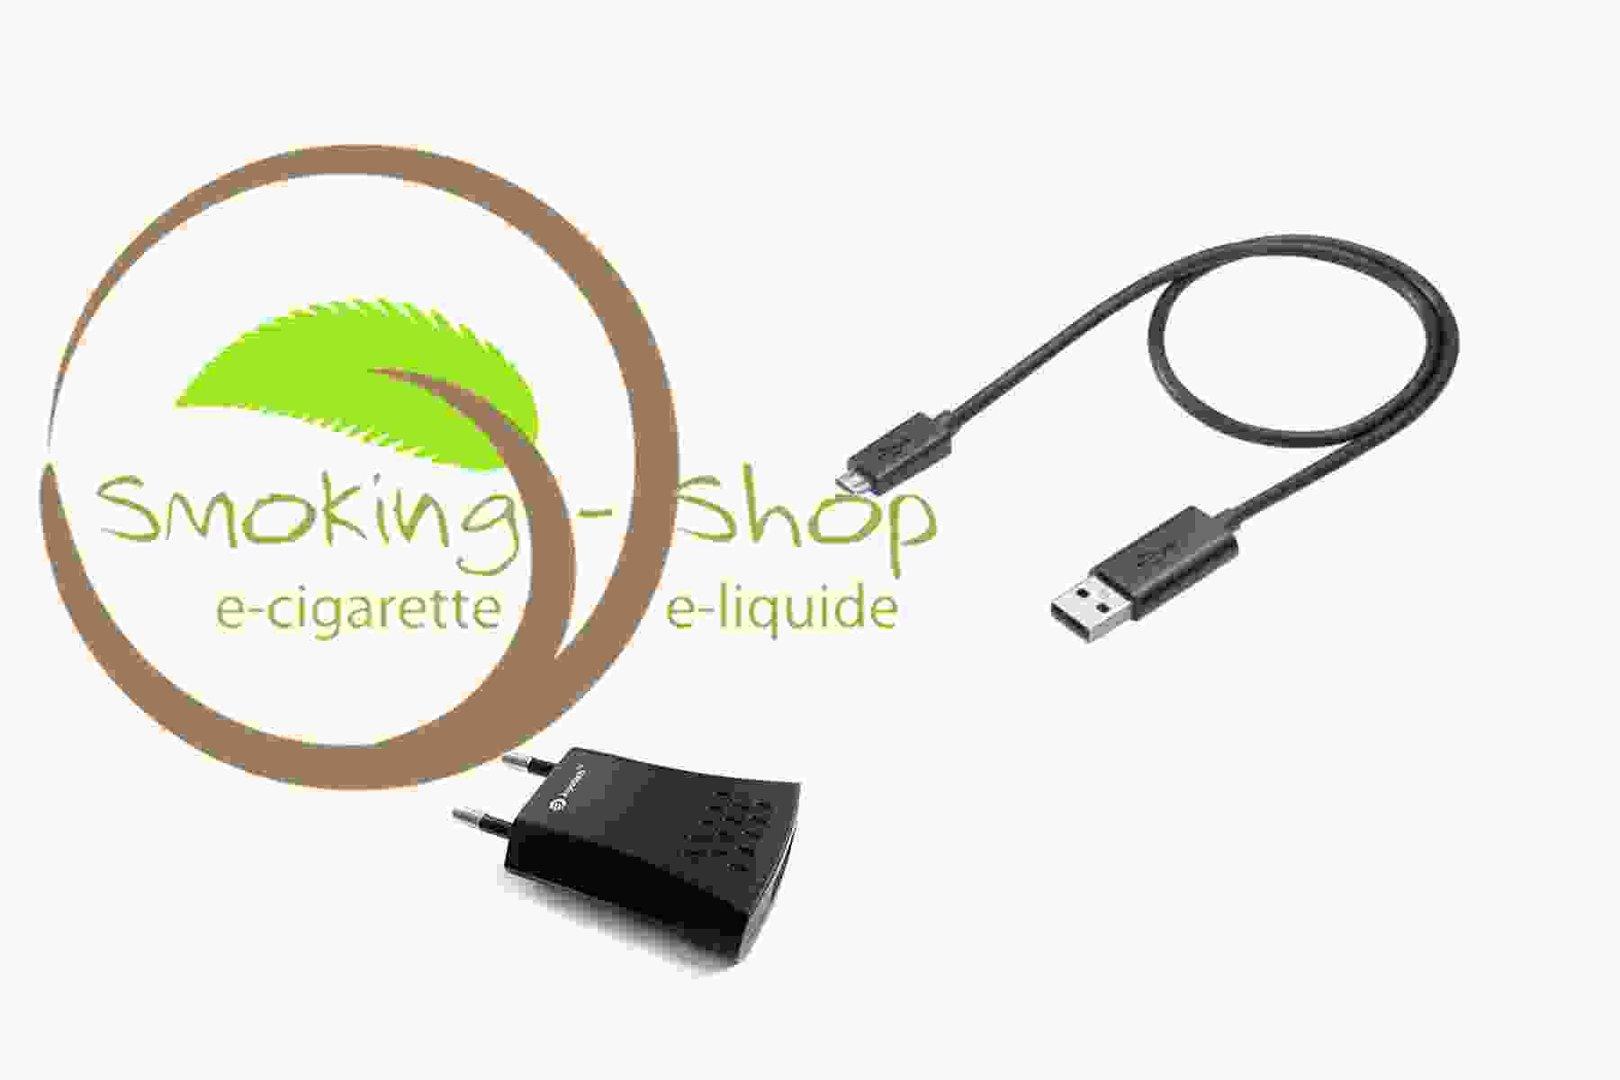 chargeur micro usb adaptateur secteur smoking shop. Black Bedroom Furniture Sets. Home Design Ideas